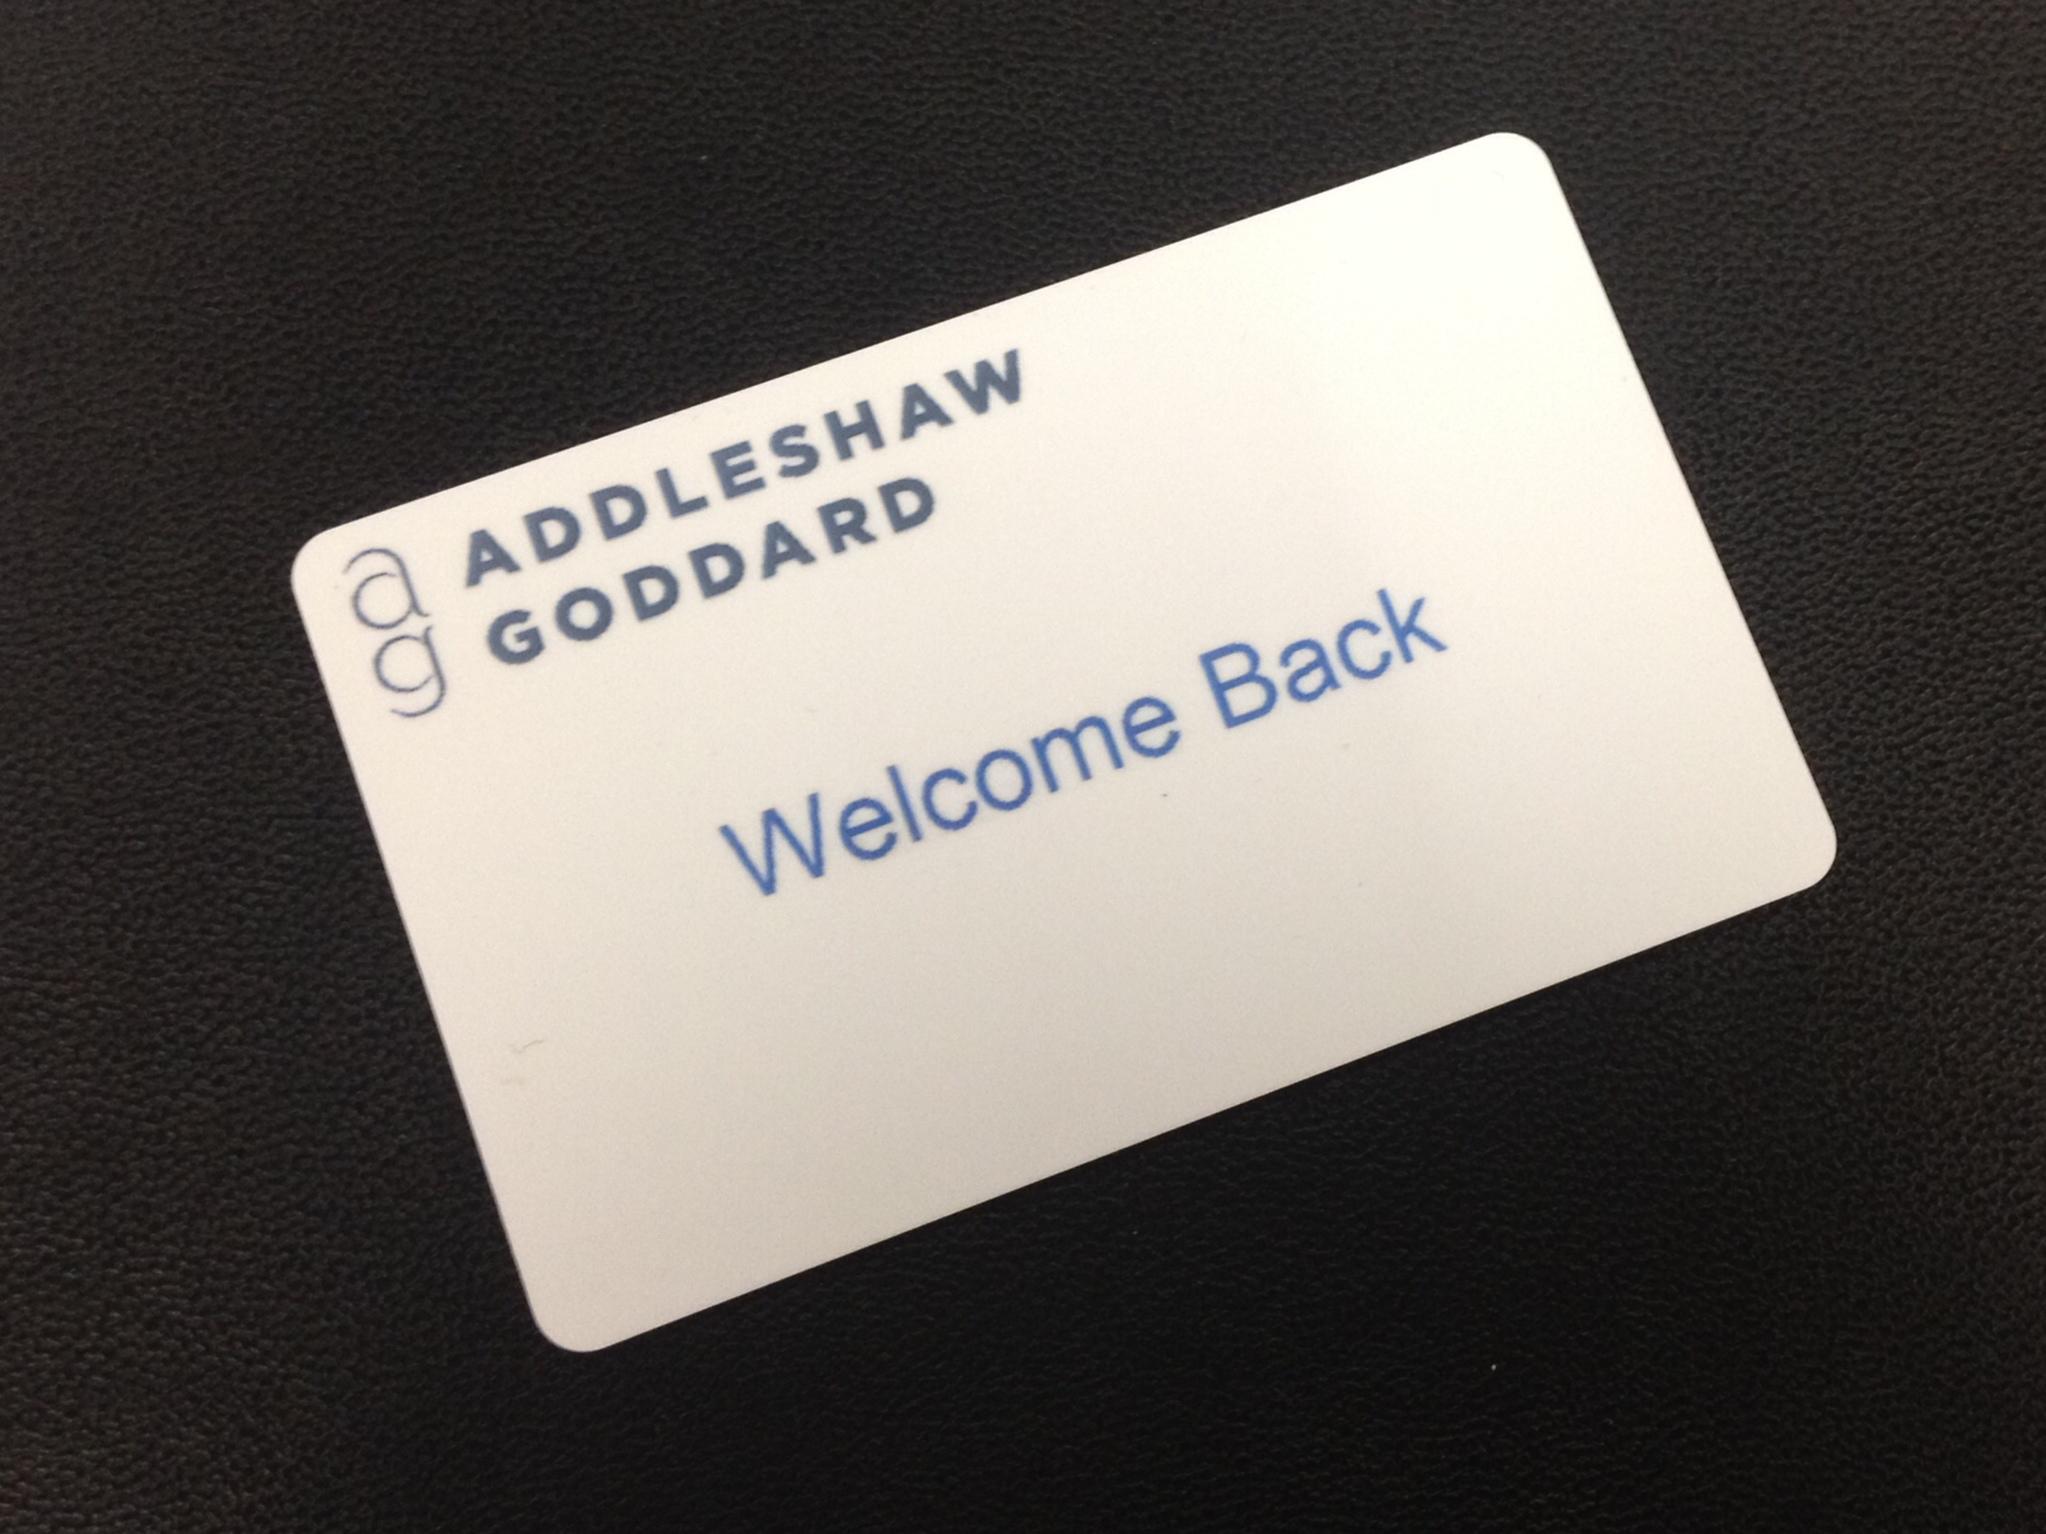 Addleshaws swipe card Tulkinghorn